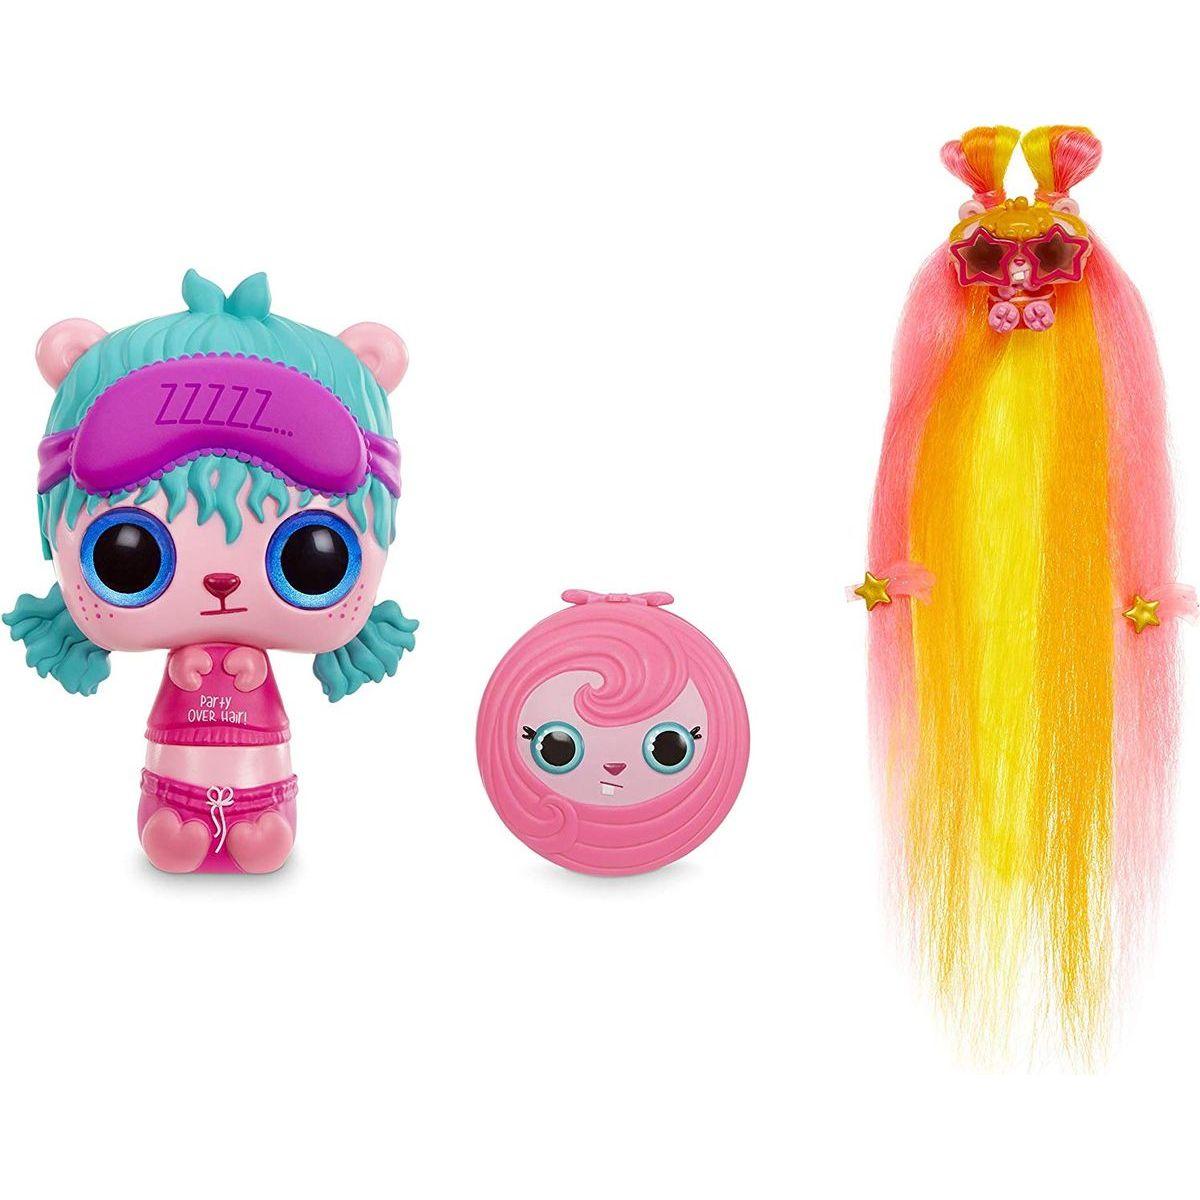 Pop Pop Hair Surprise 3-in-1 Pops 1. series fialová čelenka ZZZZZ